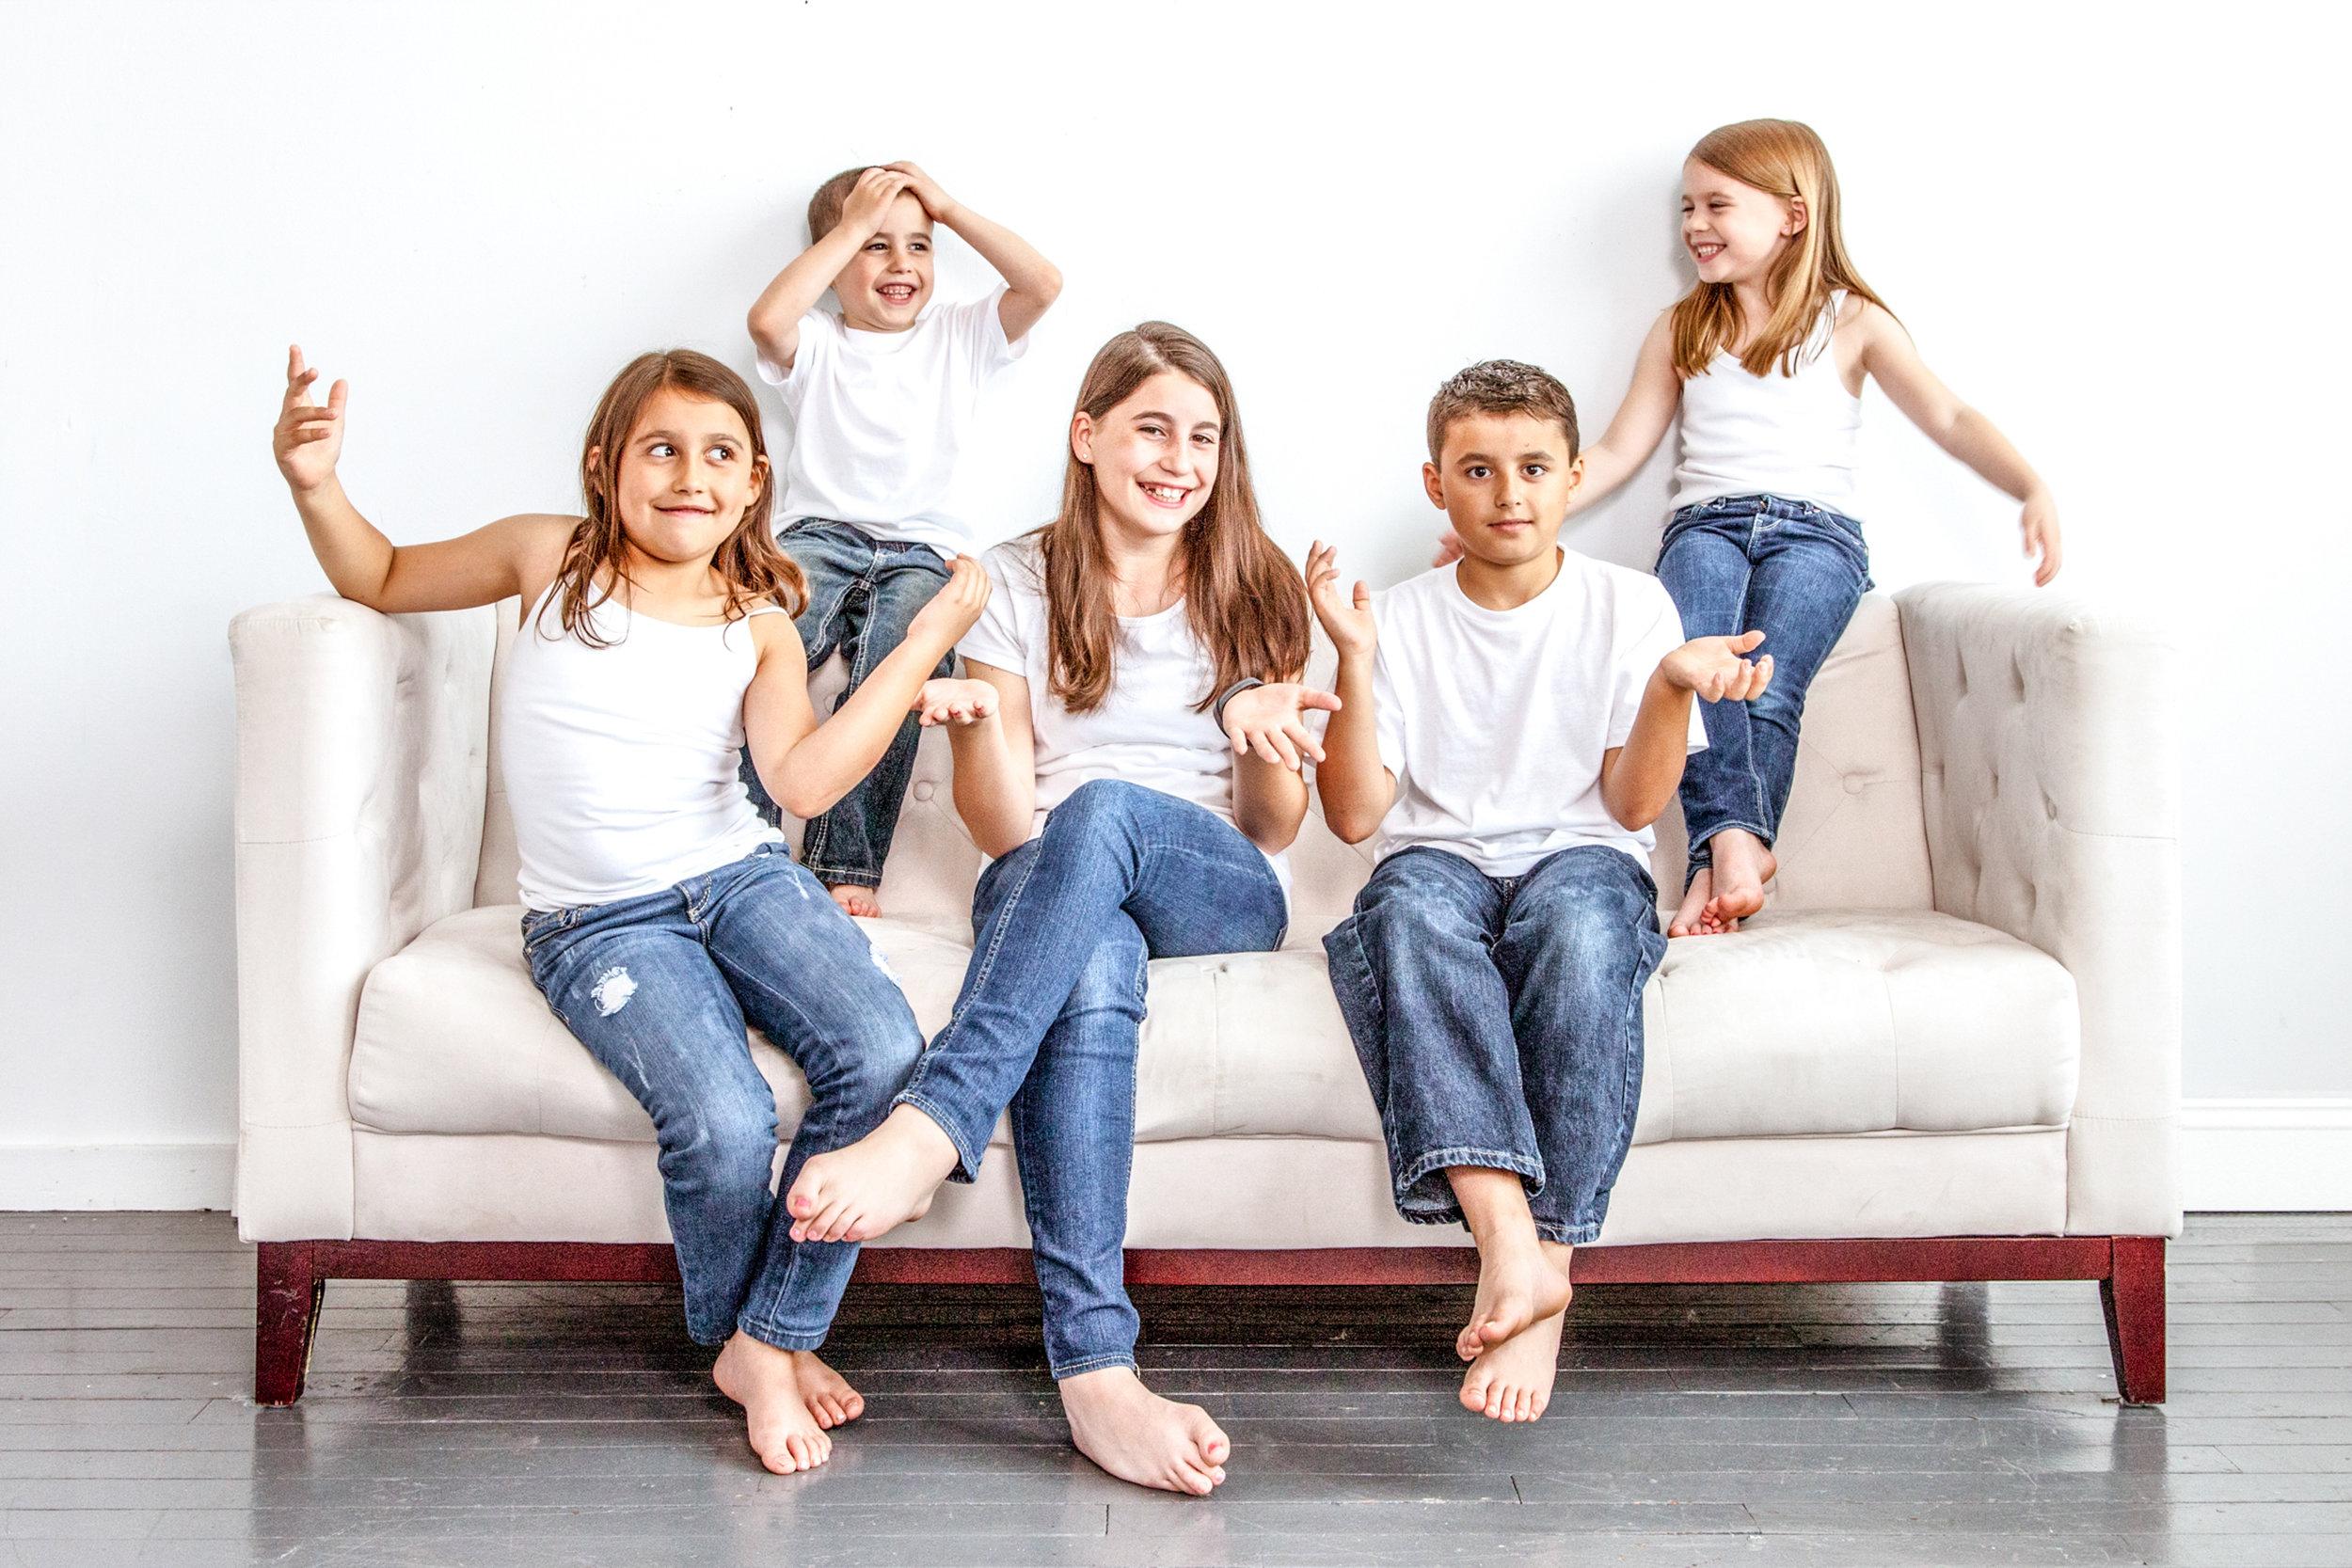 Provost Family_020_4MPIX.jpg